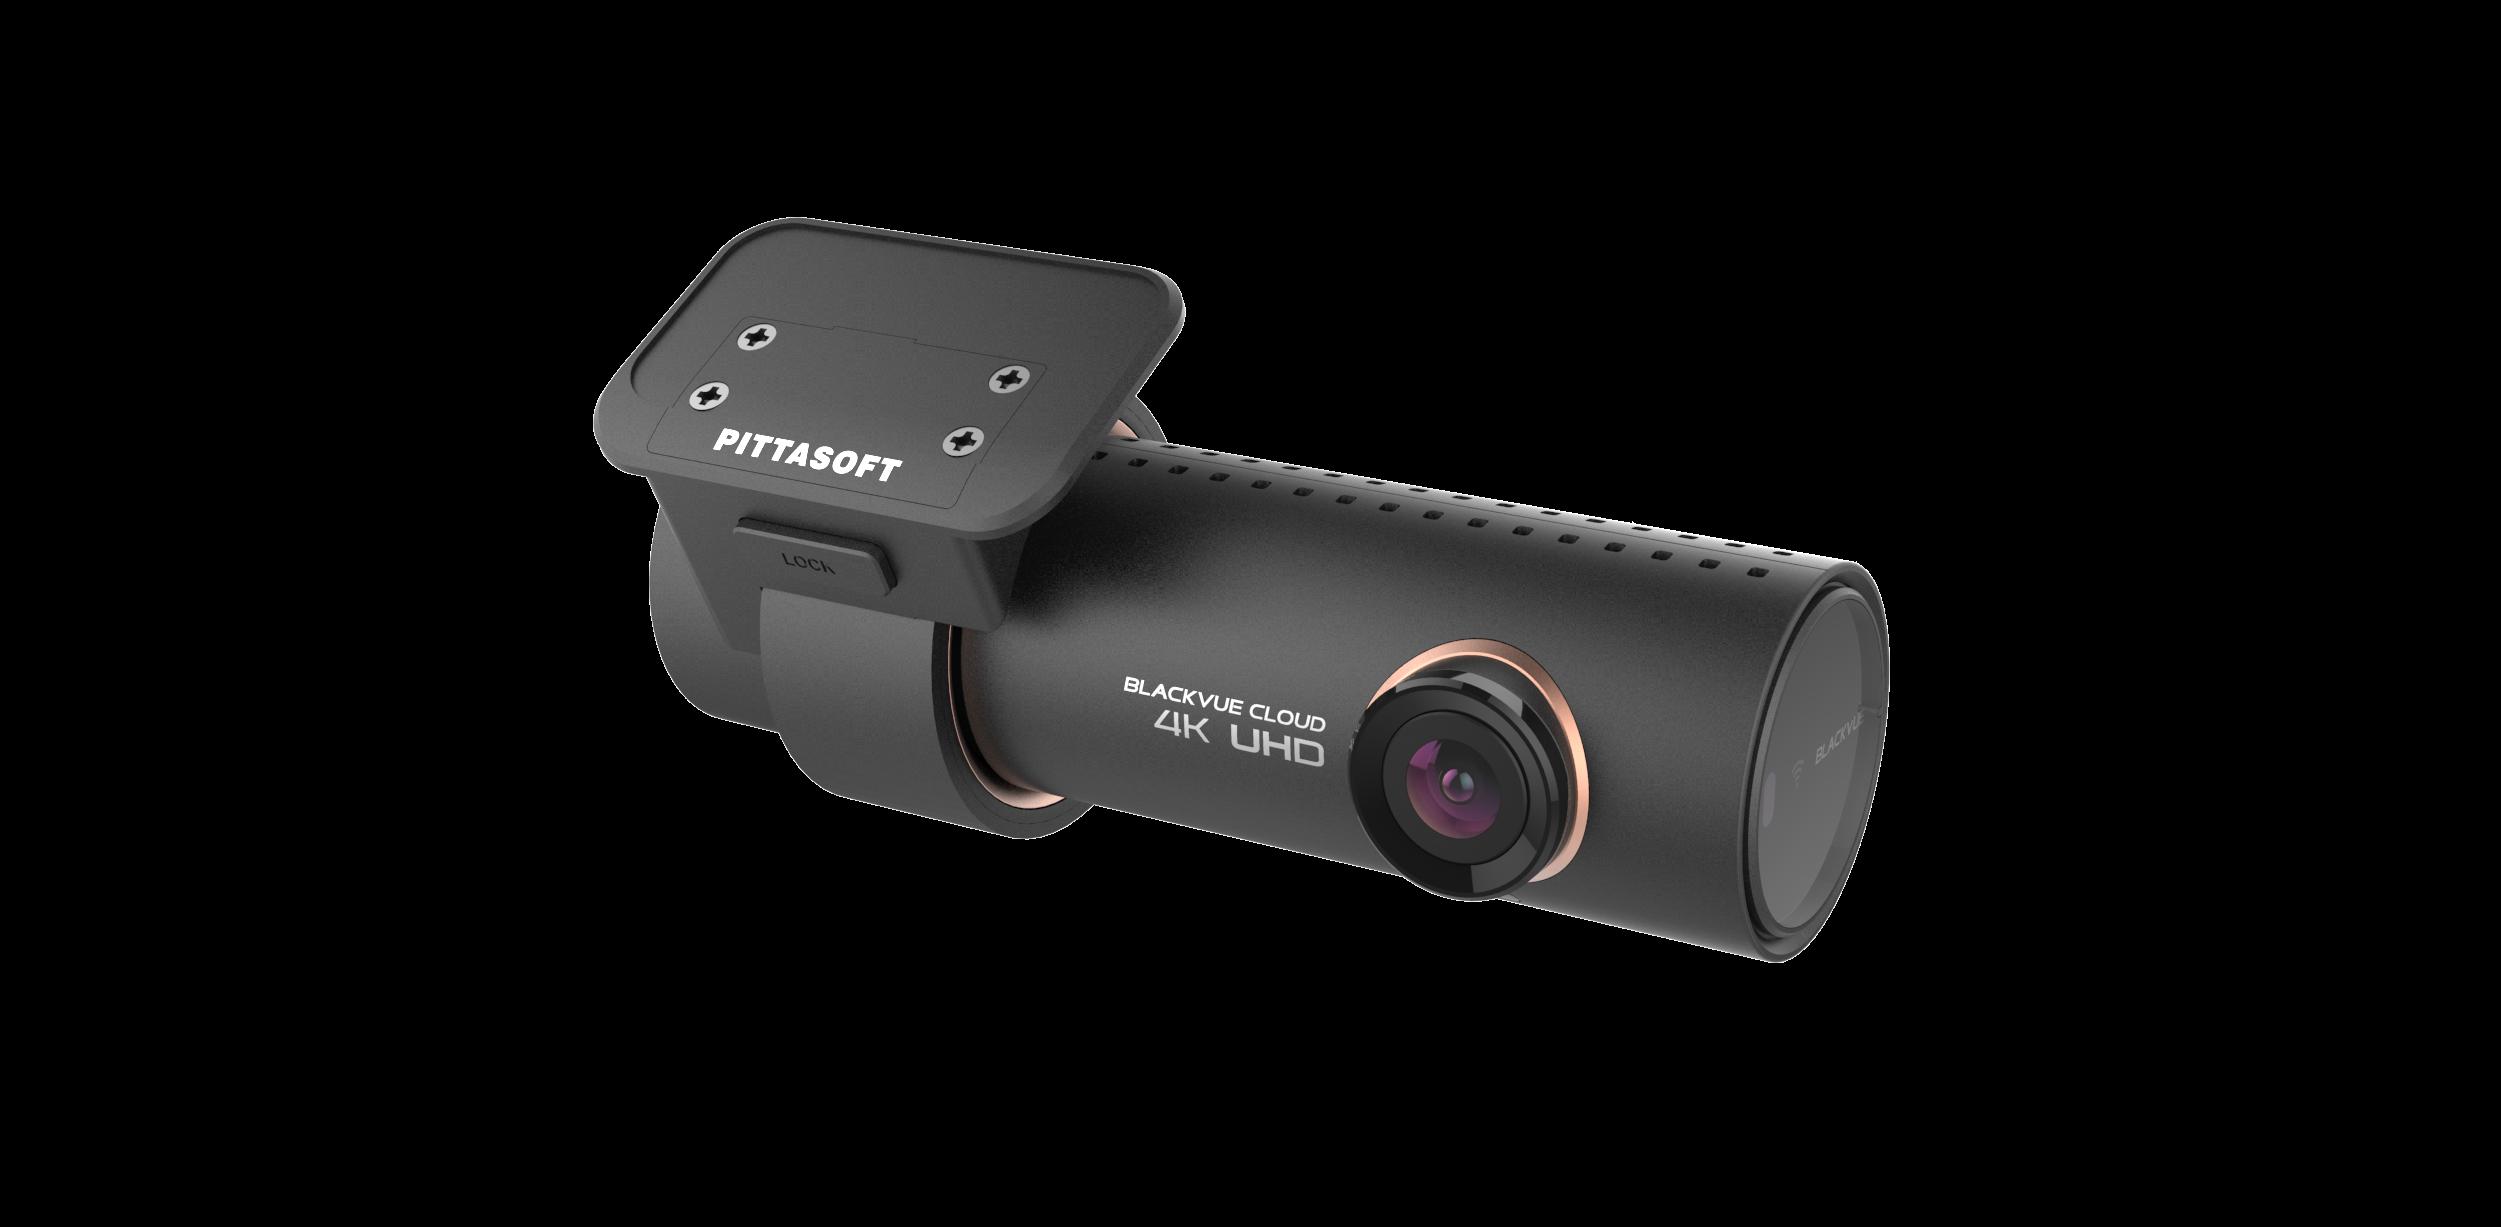 Blackvue 900s 4k Dashcam Shield IT